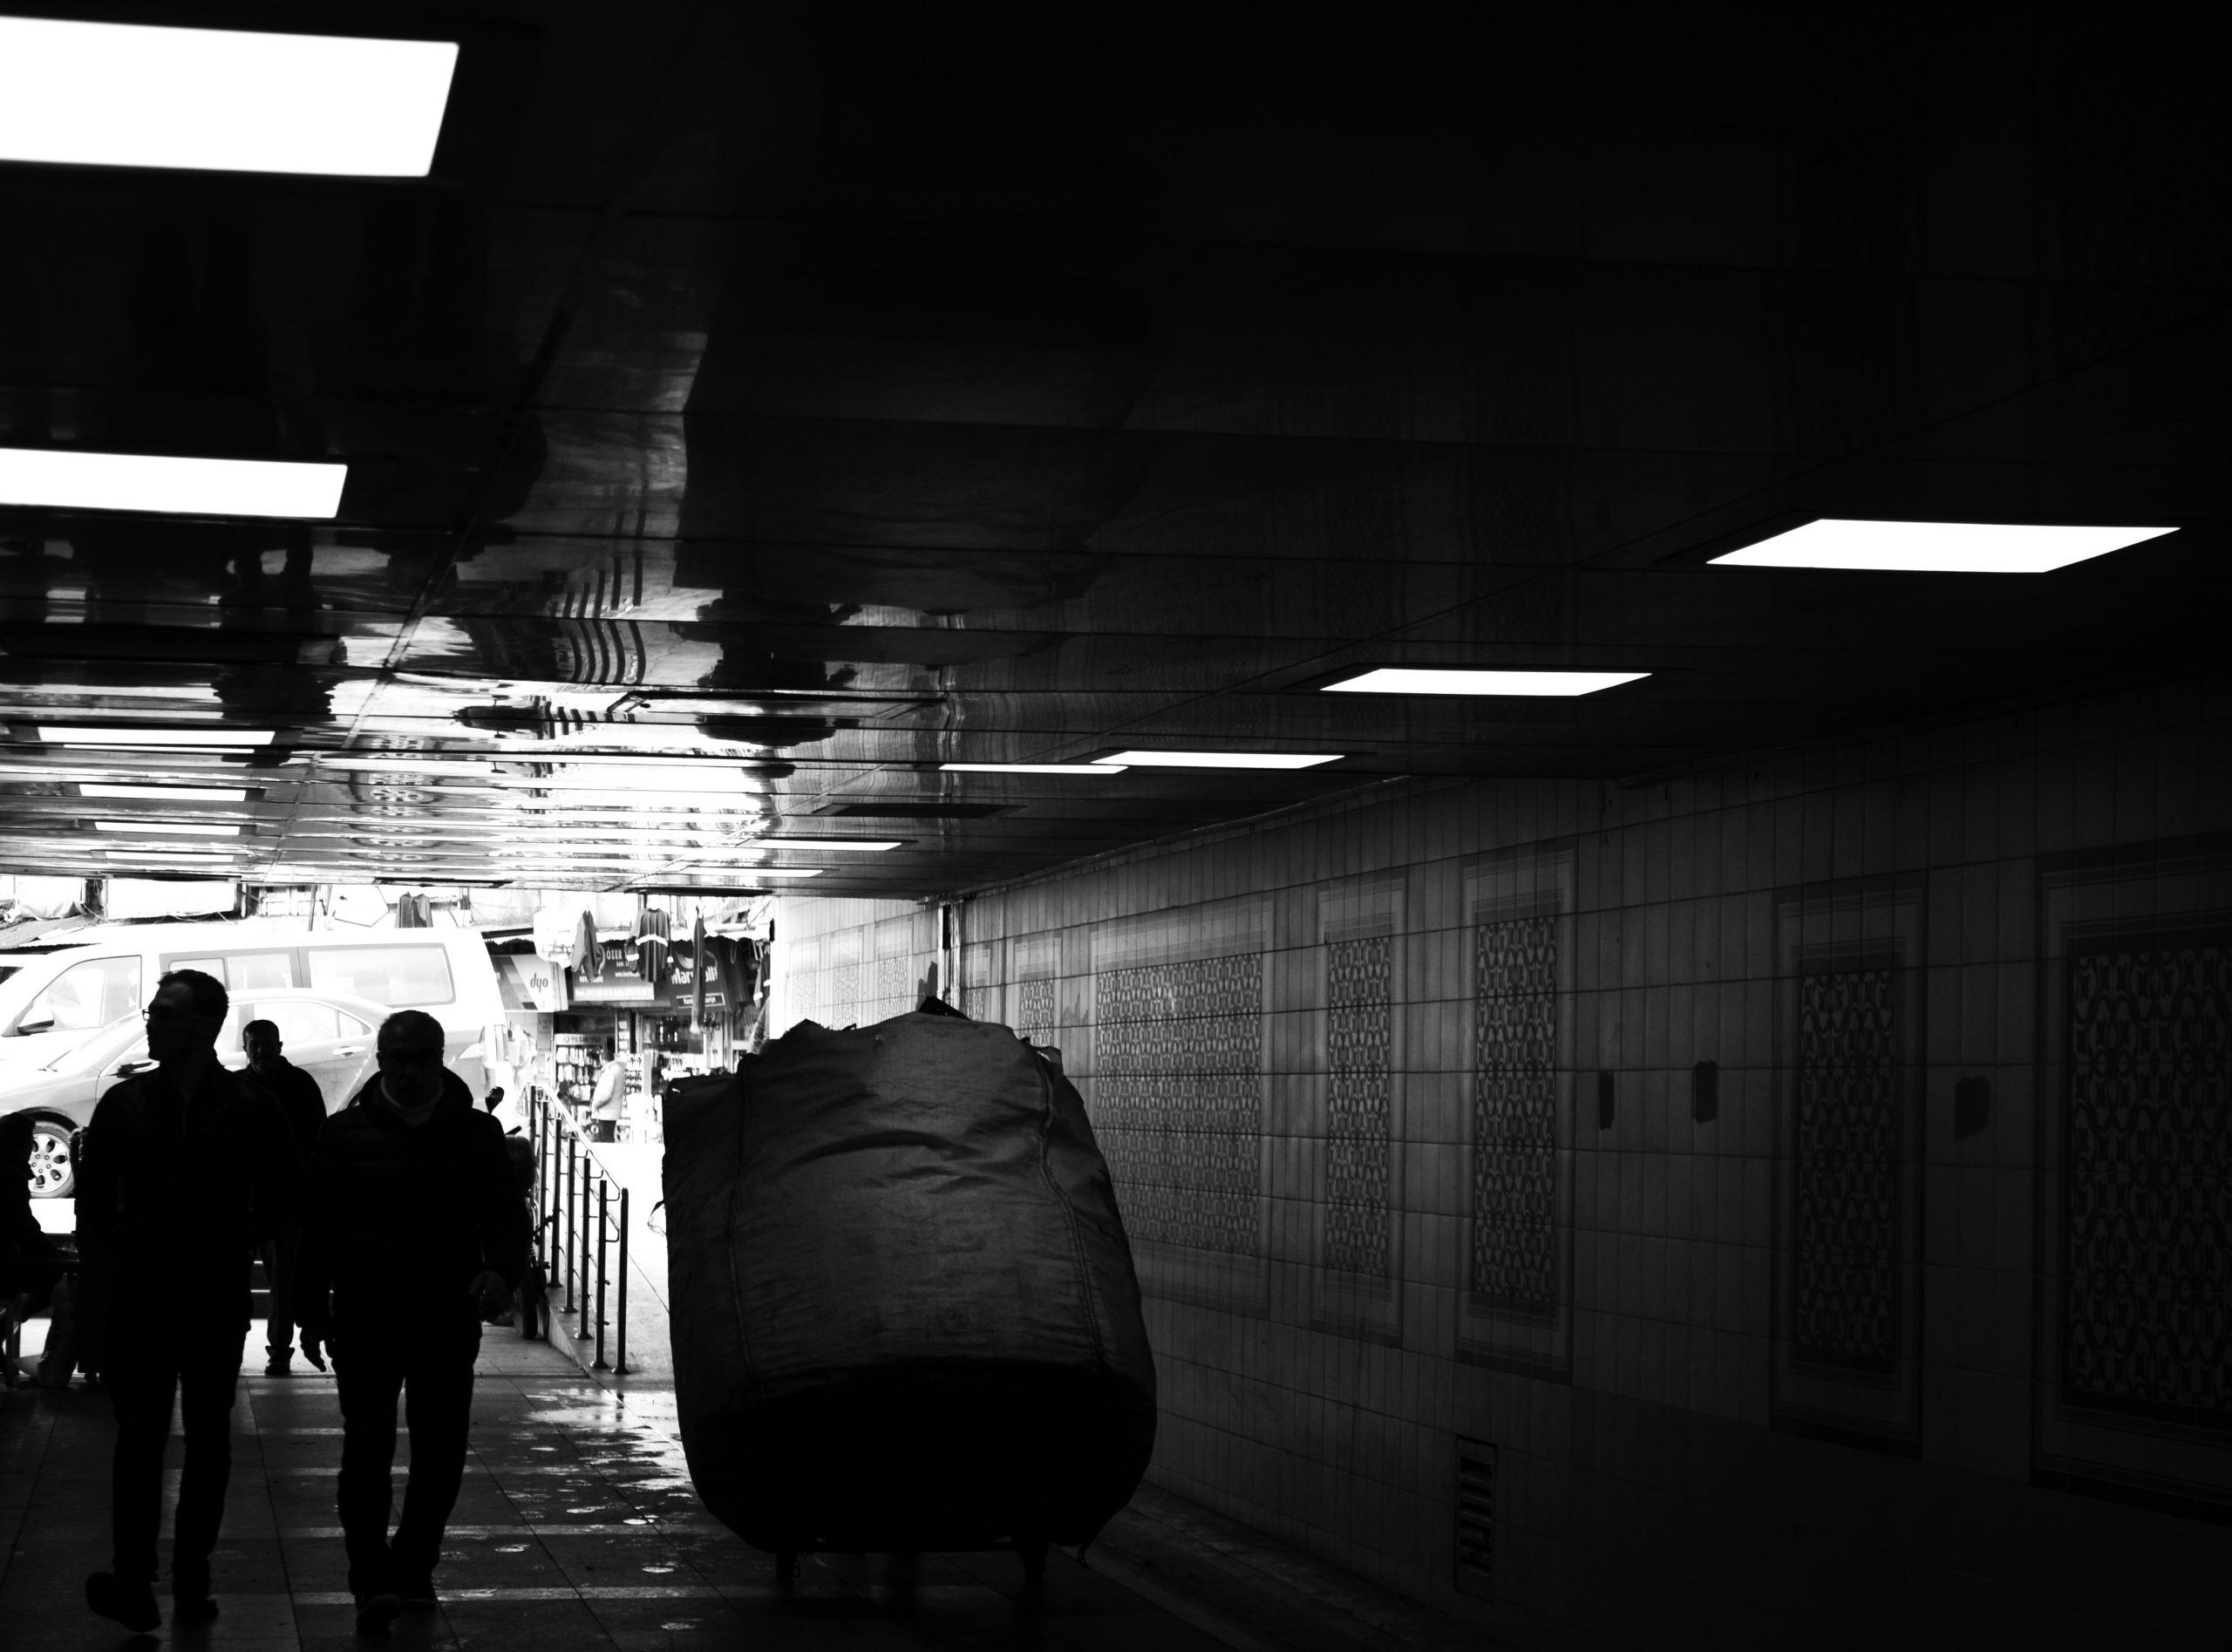 Pedestrian underpass in Istanbul